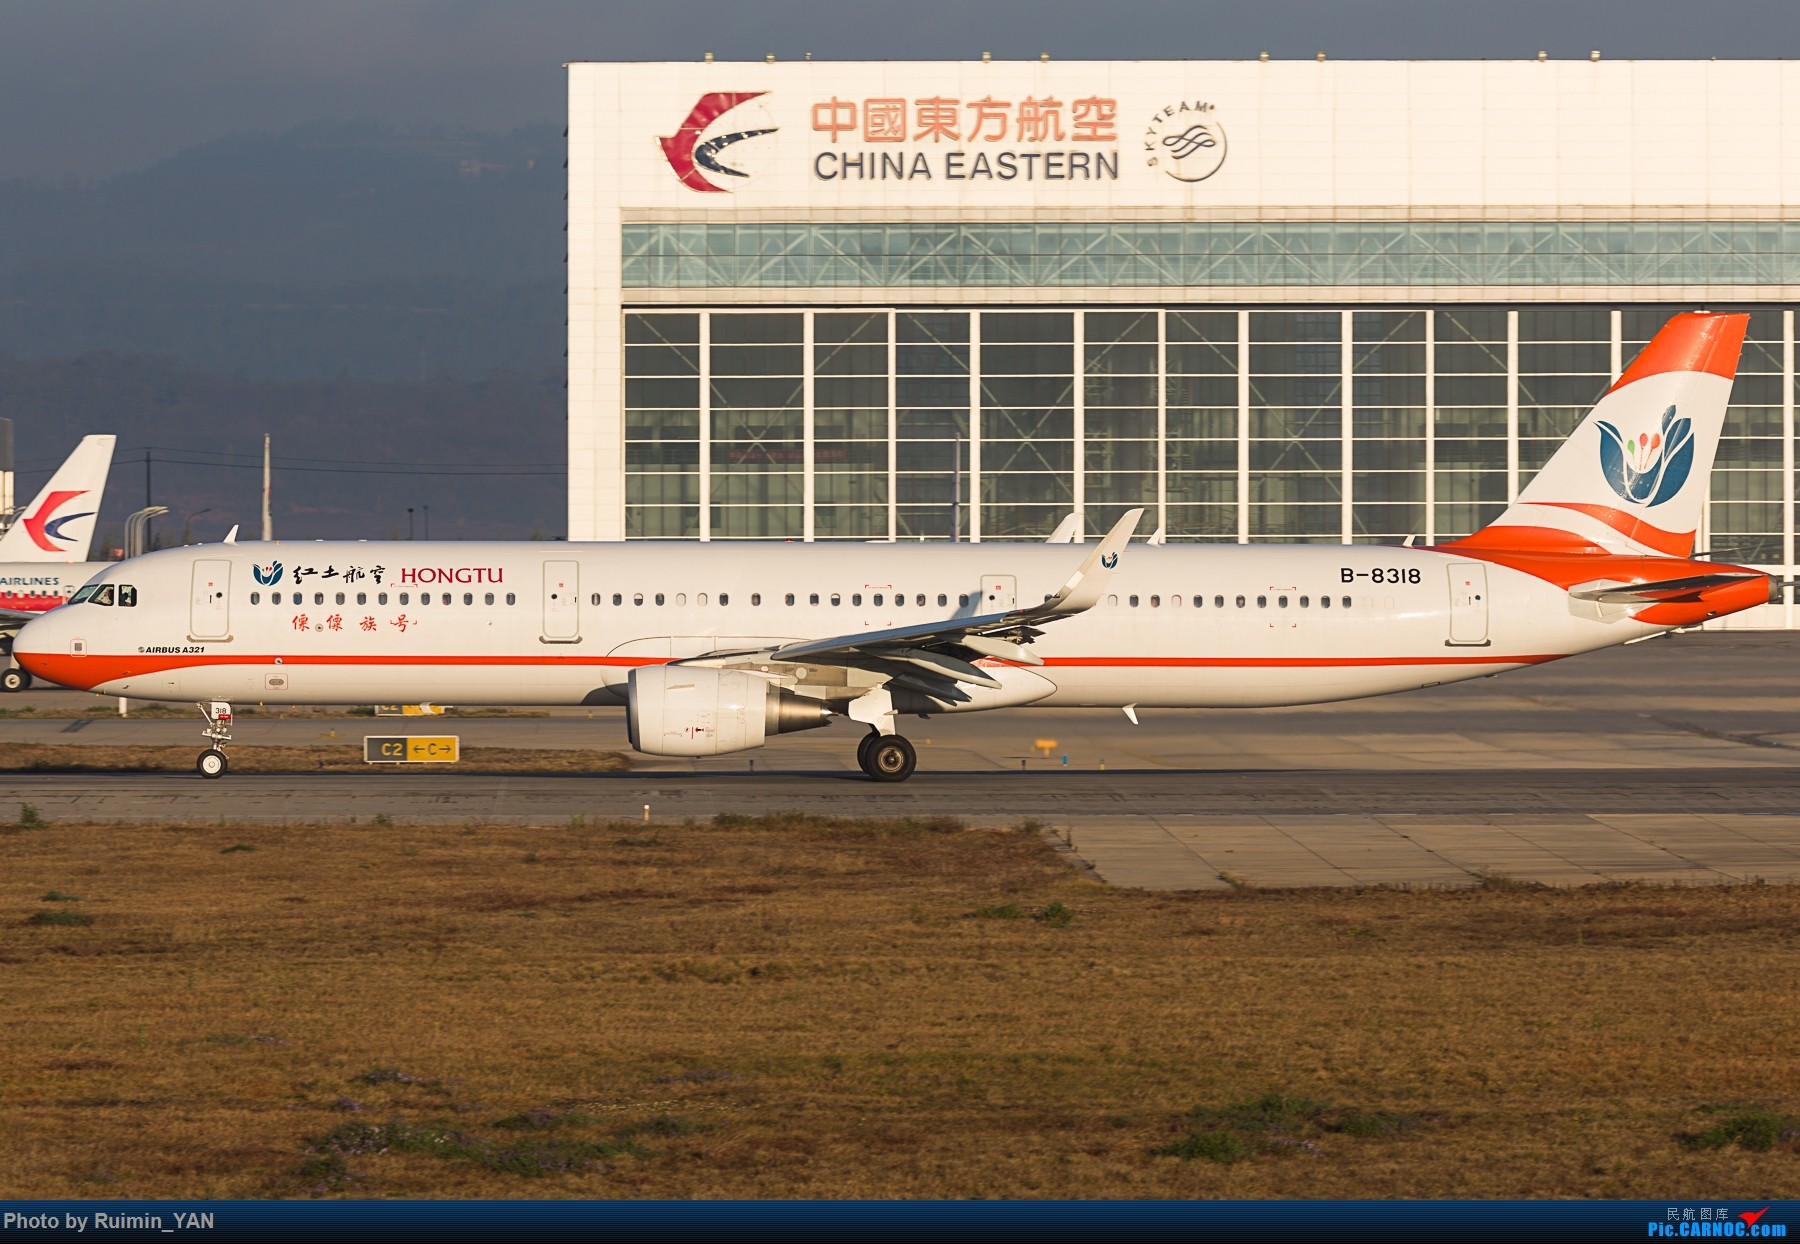 Re:【KMG】红土航空(A6) 傣族号B-8285 傈僳族号B-8318 A321 AIRBUS A321-200 B-8318 中国昆明长水国际机场